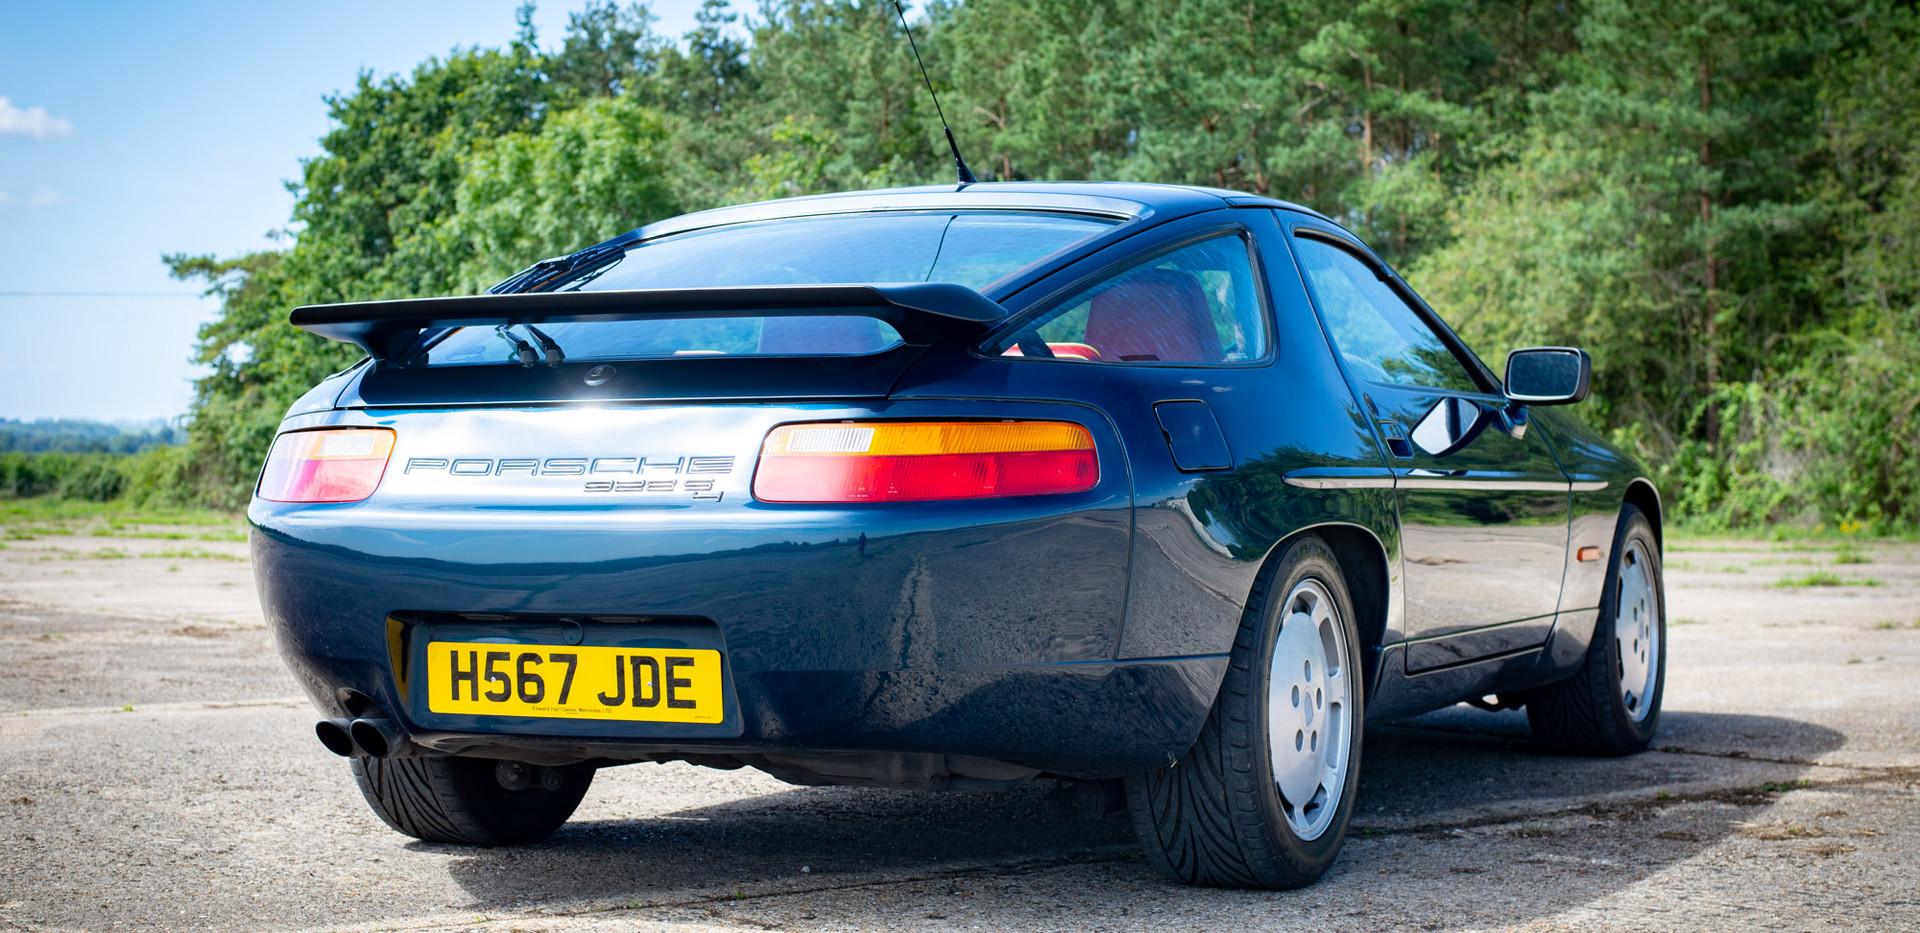 Porsche 928 S4 UPDATE-7.jpg